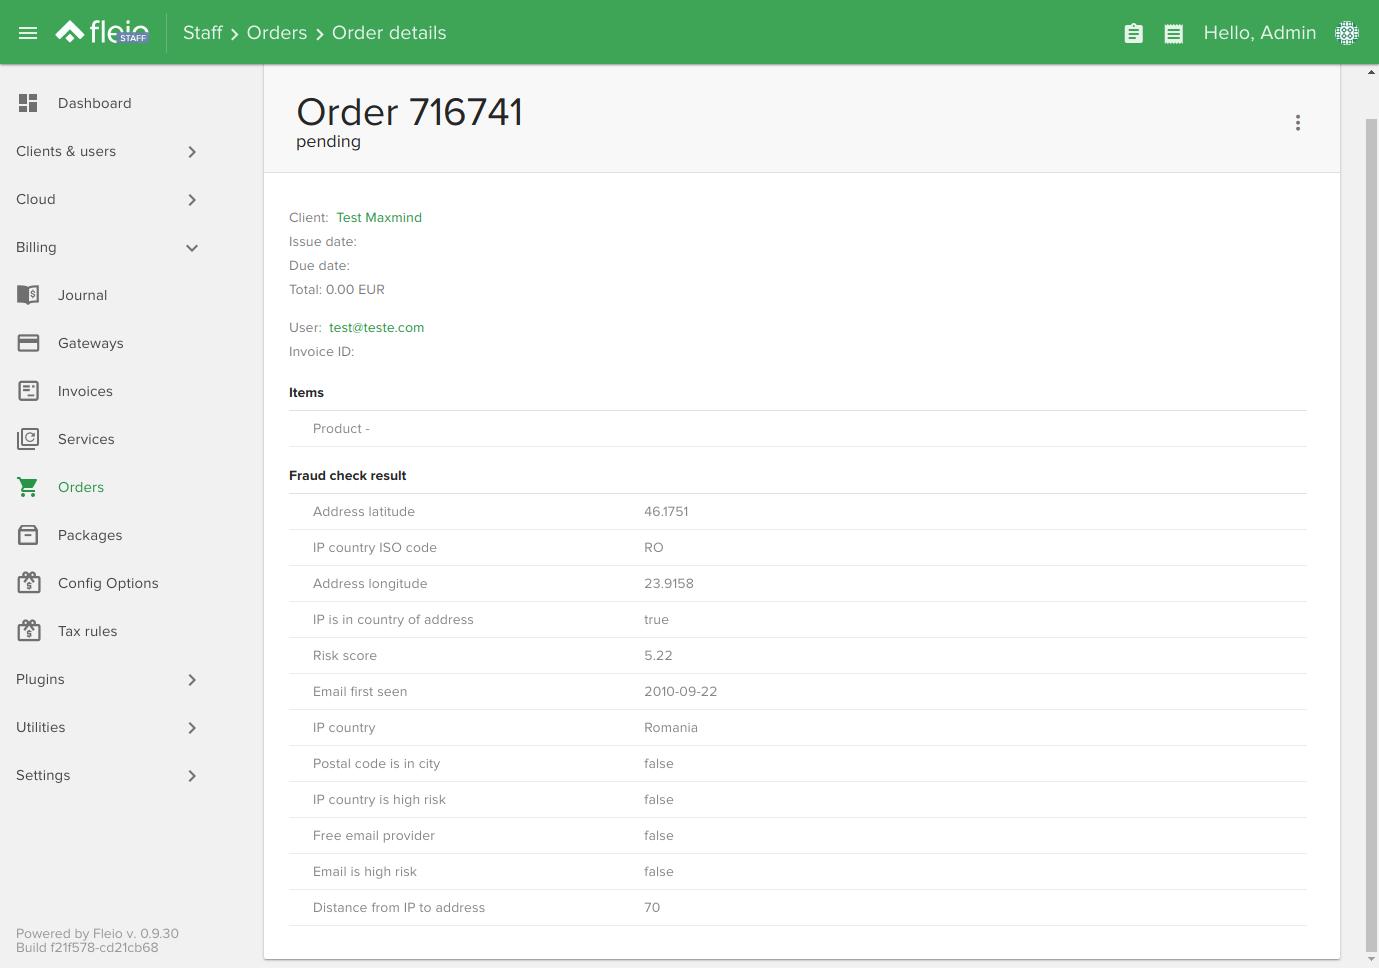 MaxMind order fraud check